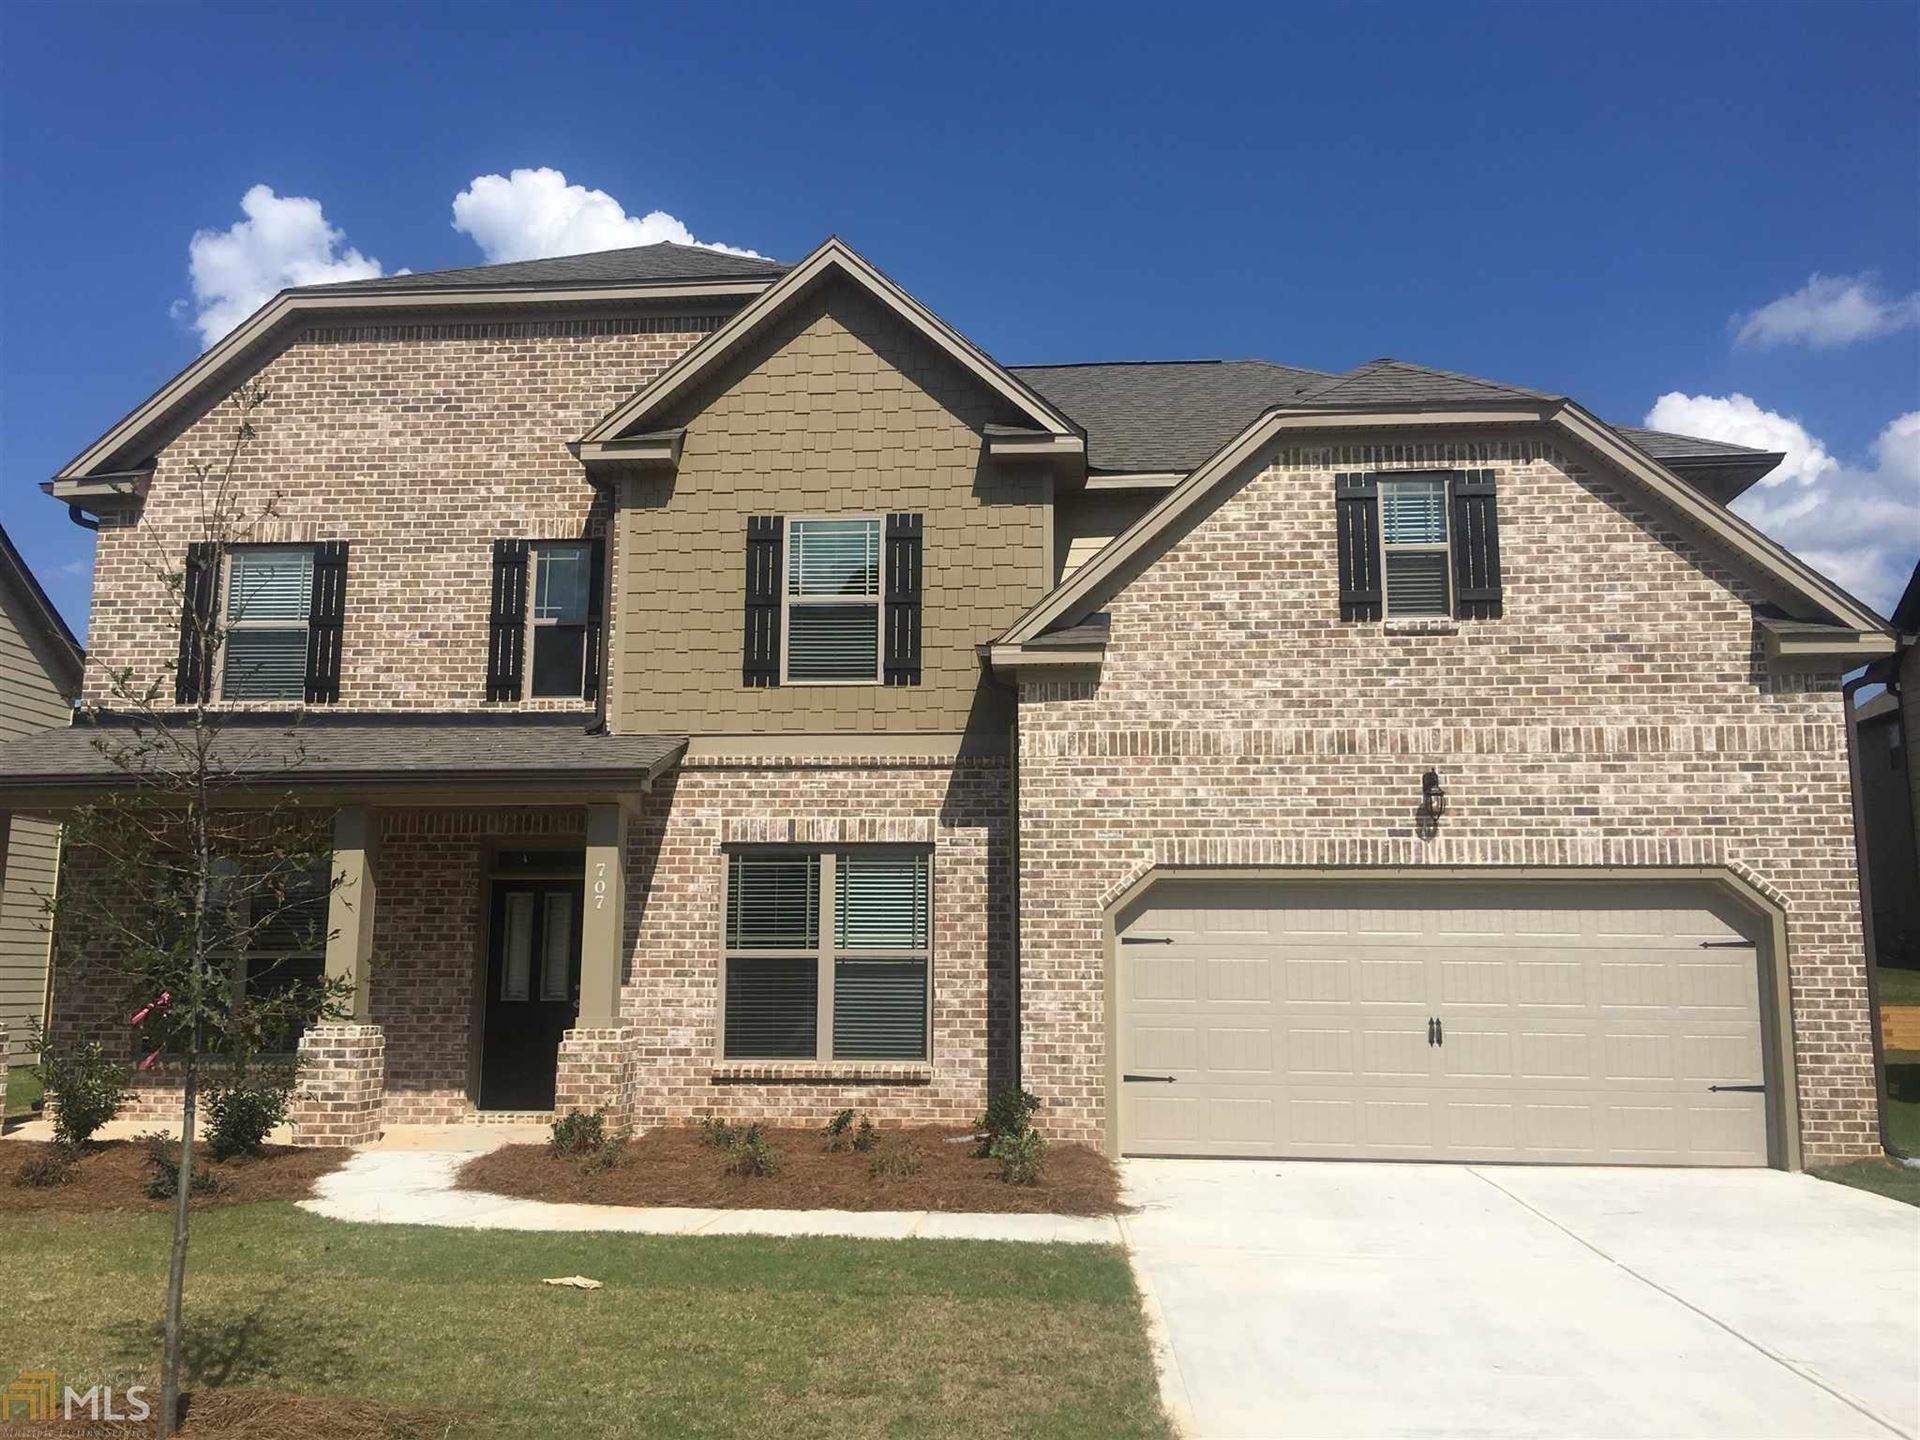 2447 Rose Hill Ct, Lawrenceville, GA 30044 - MLS#: 8769279